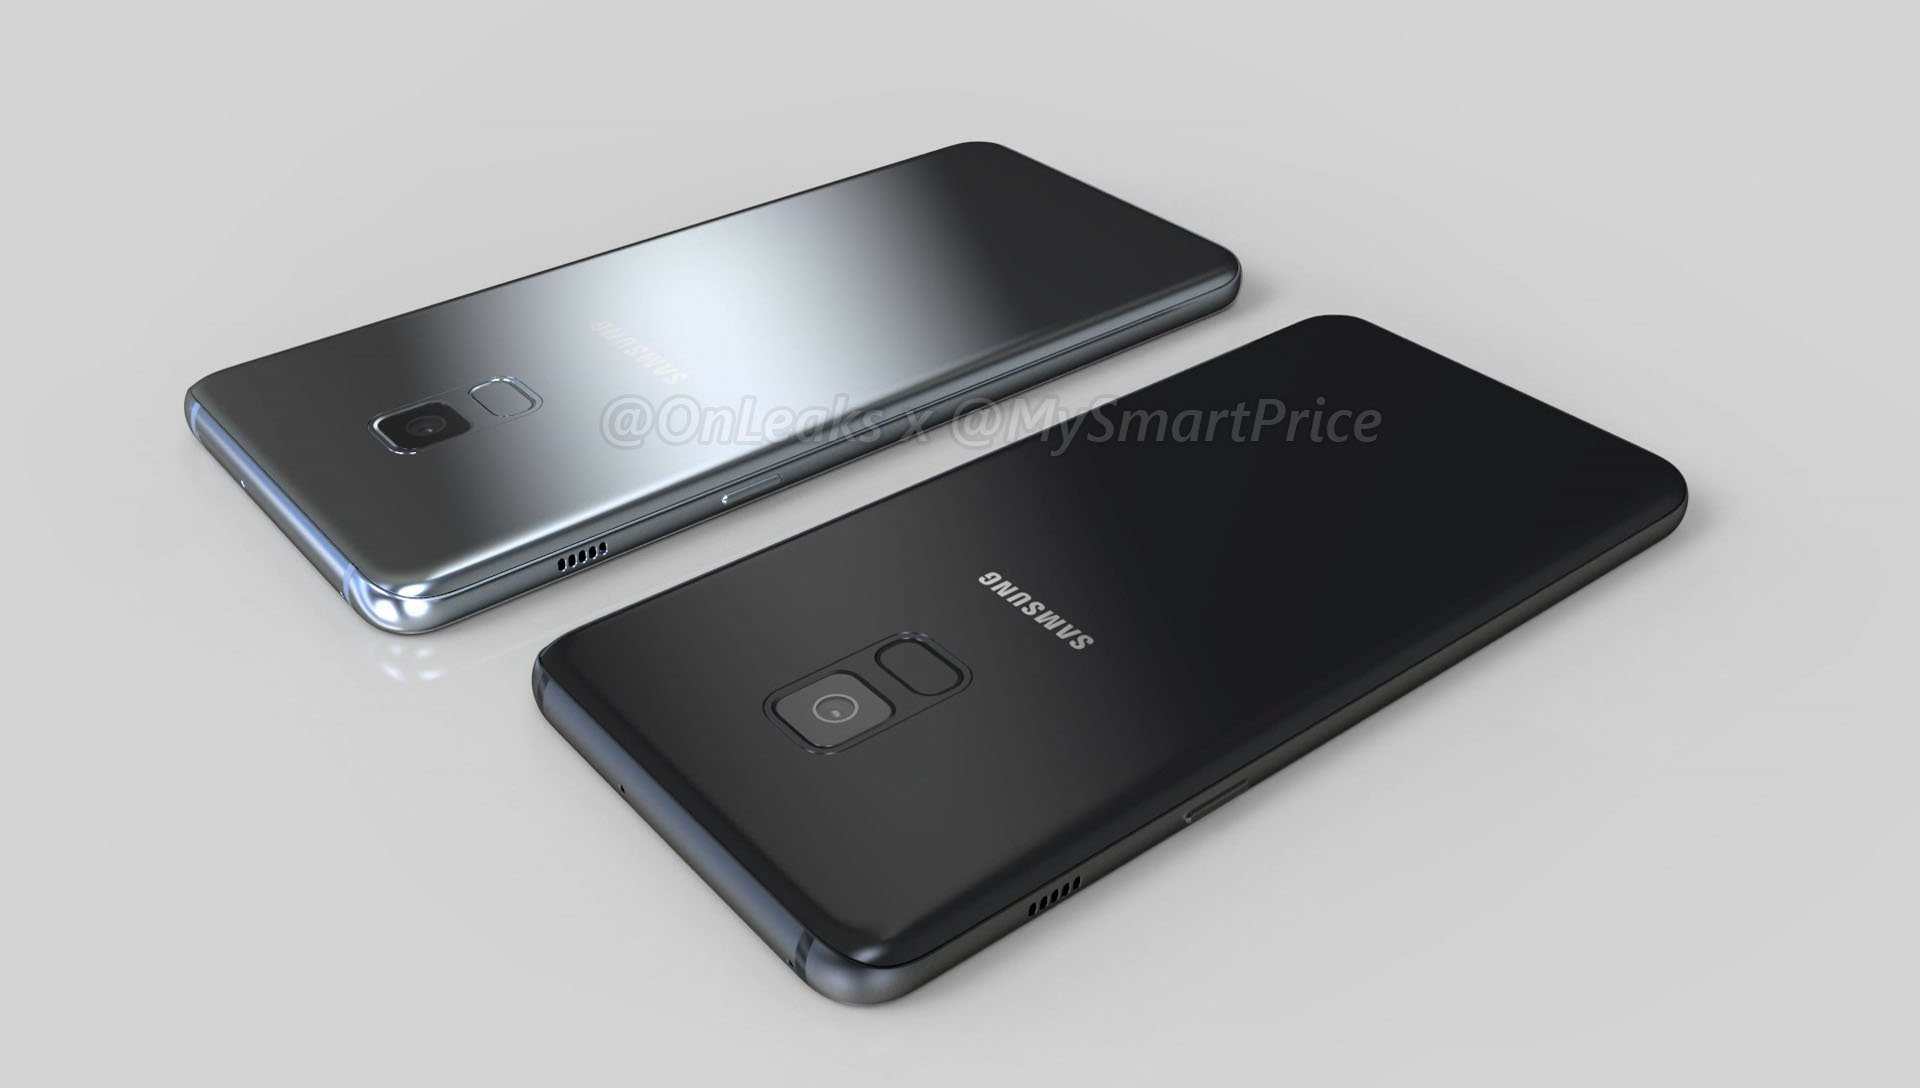 @OnLeaks svela i Samsung Galaxy A5 2018 e Galaxy A7 2018